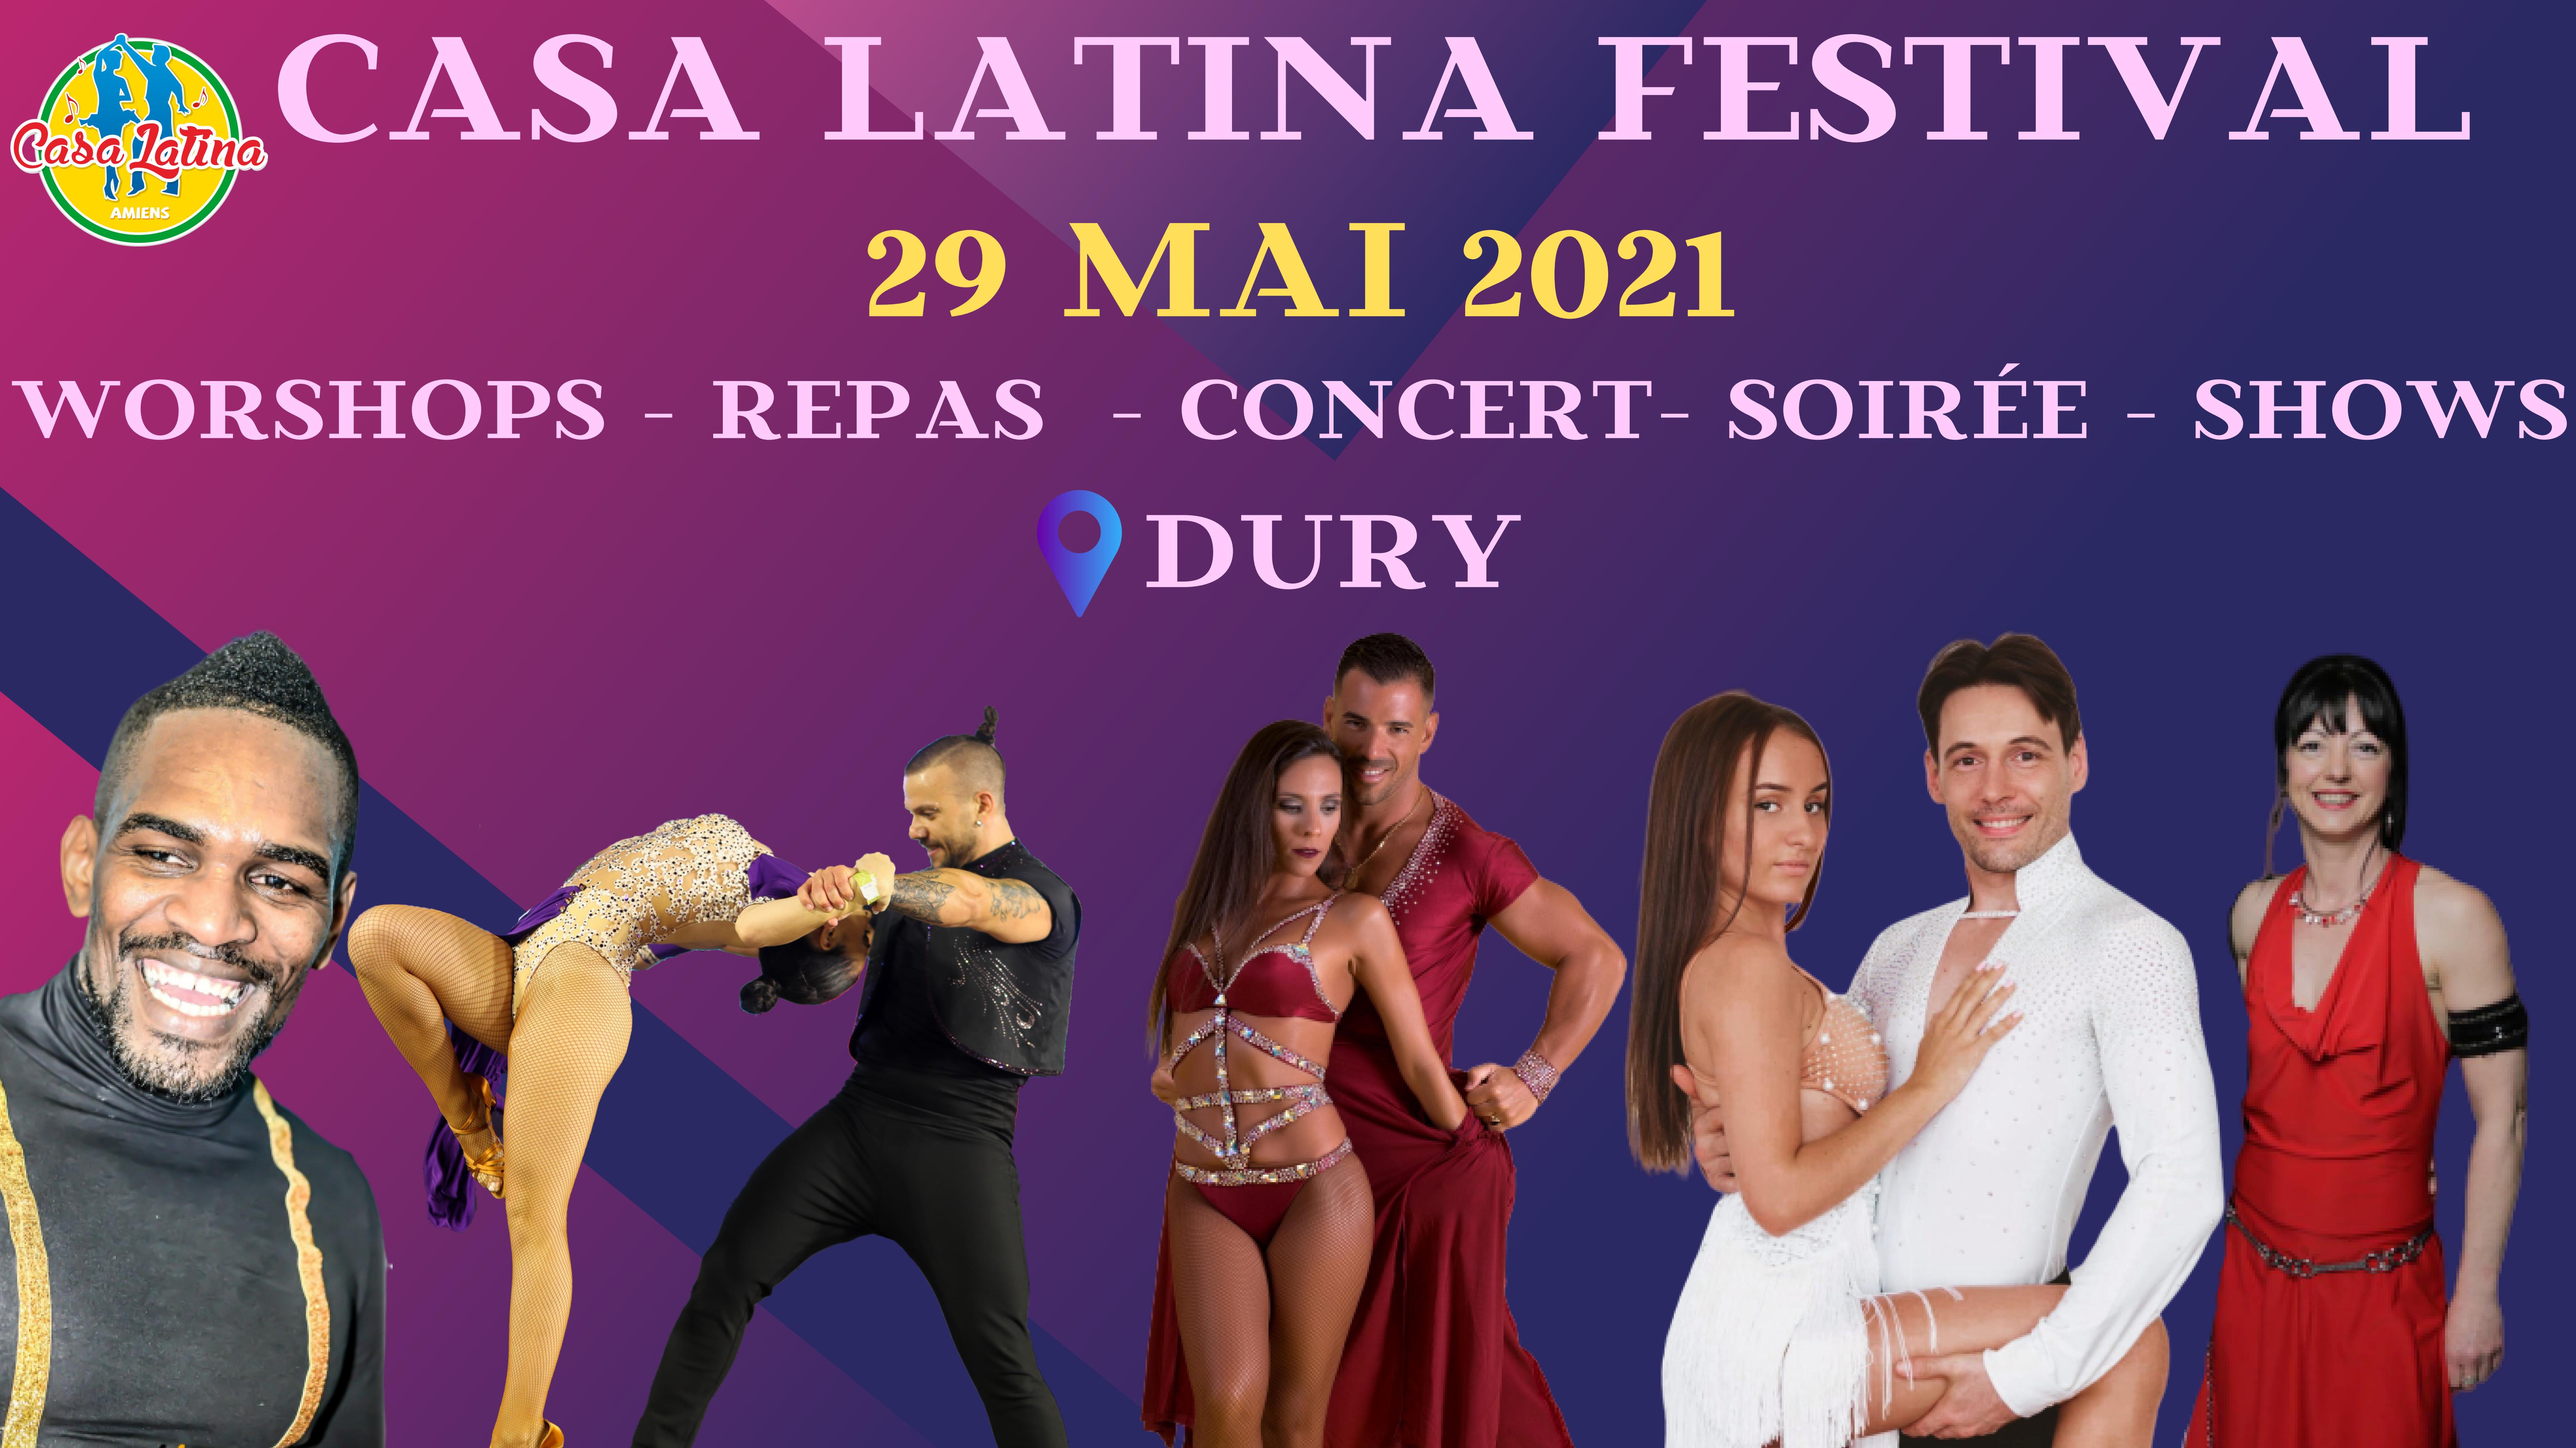 FESTIVAL CASA LATINA 2021